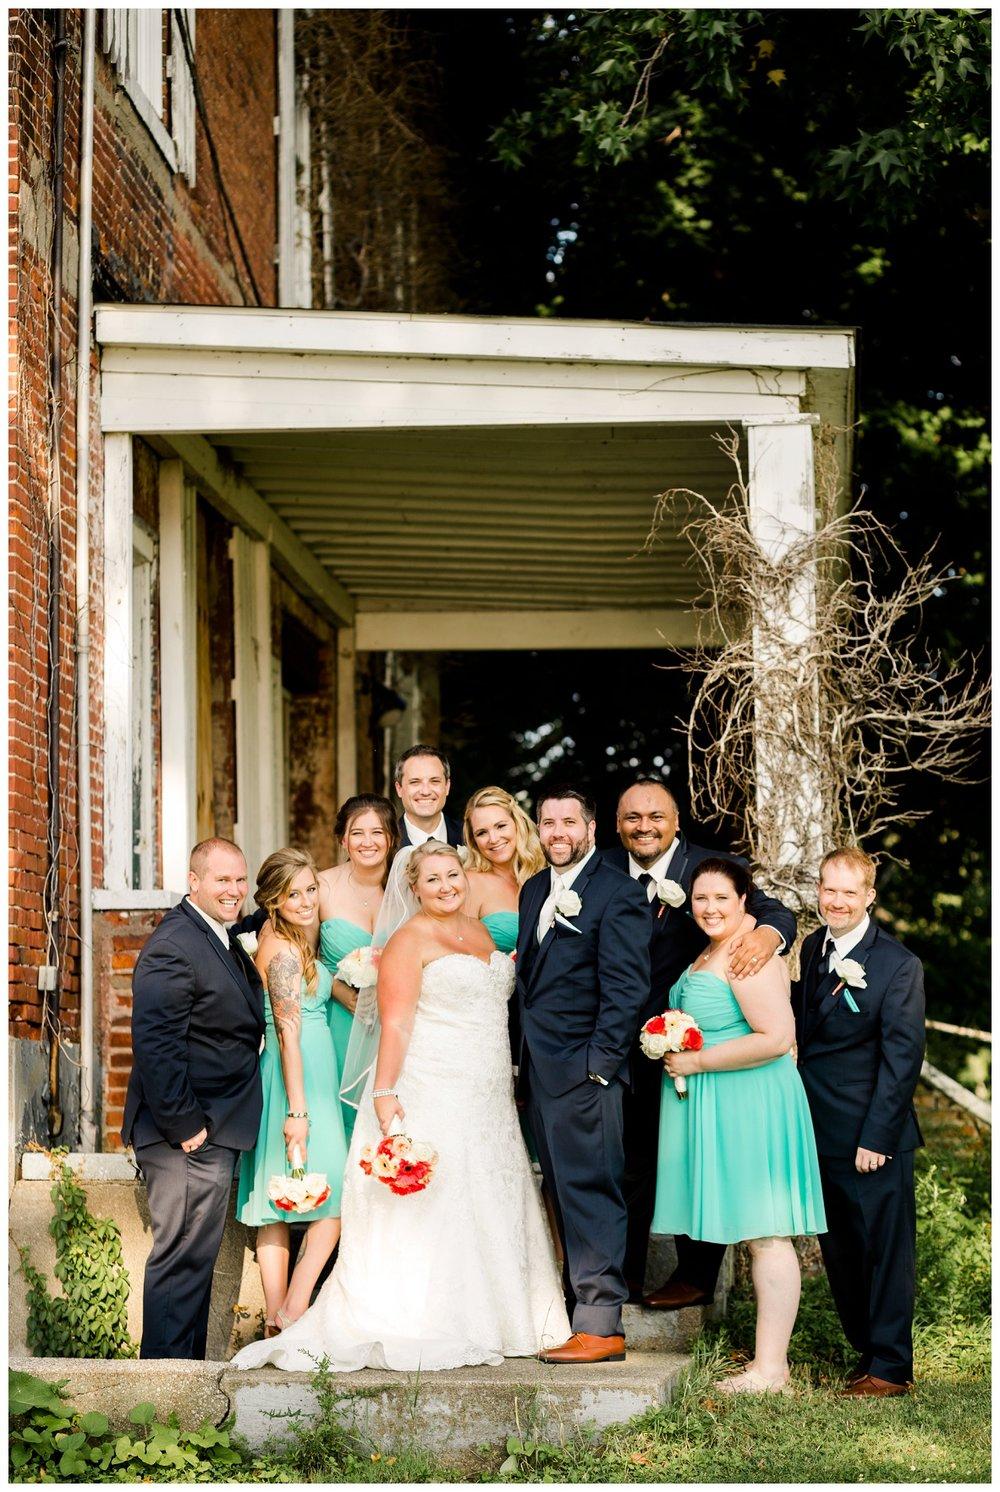 Mr. and Mrs. Kramp_0043.jpg